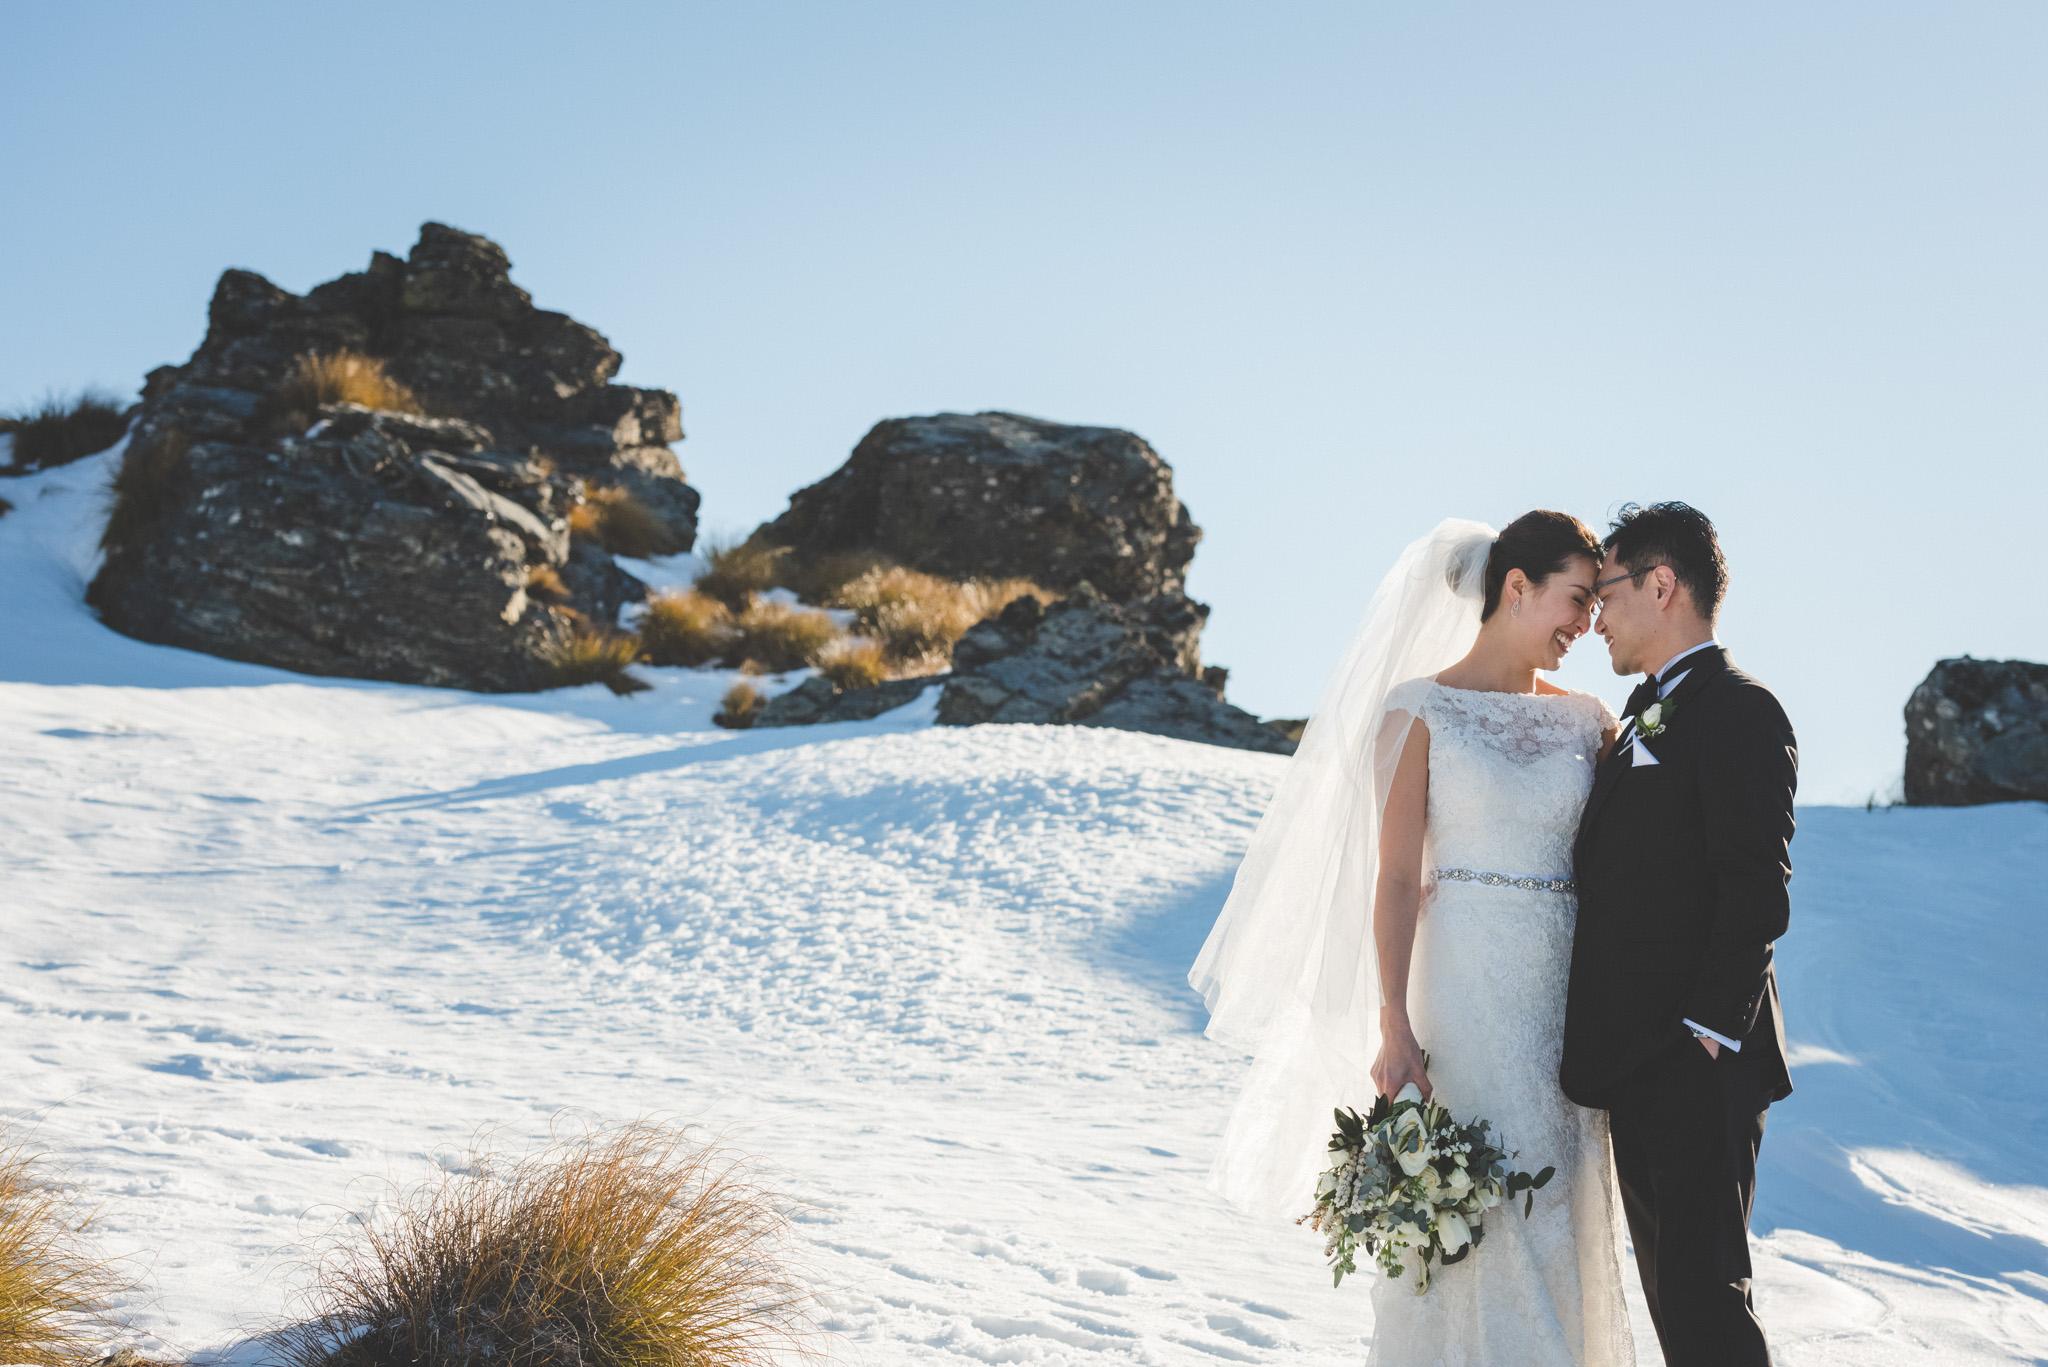 winter heli wedding package